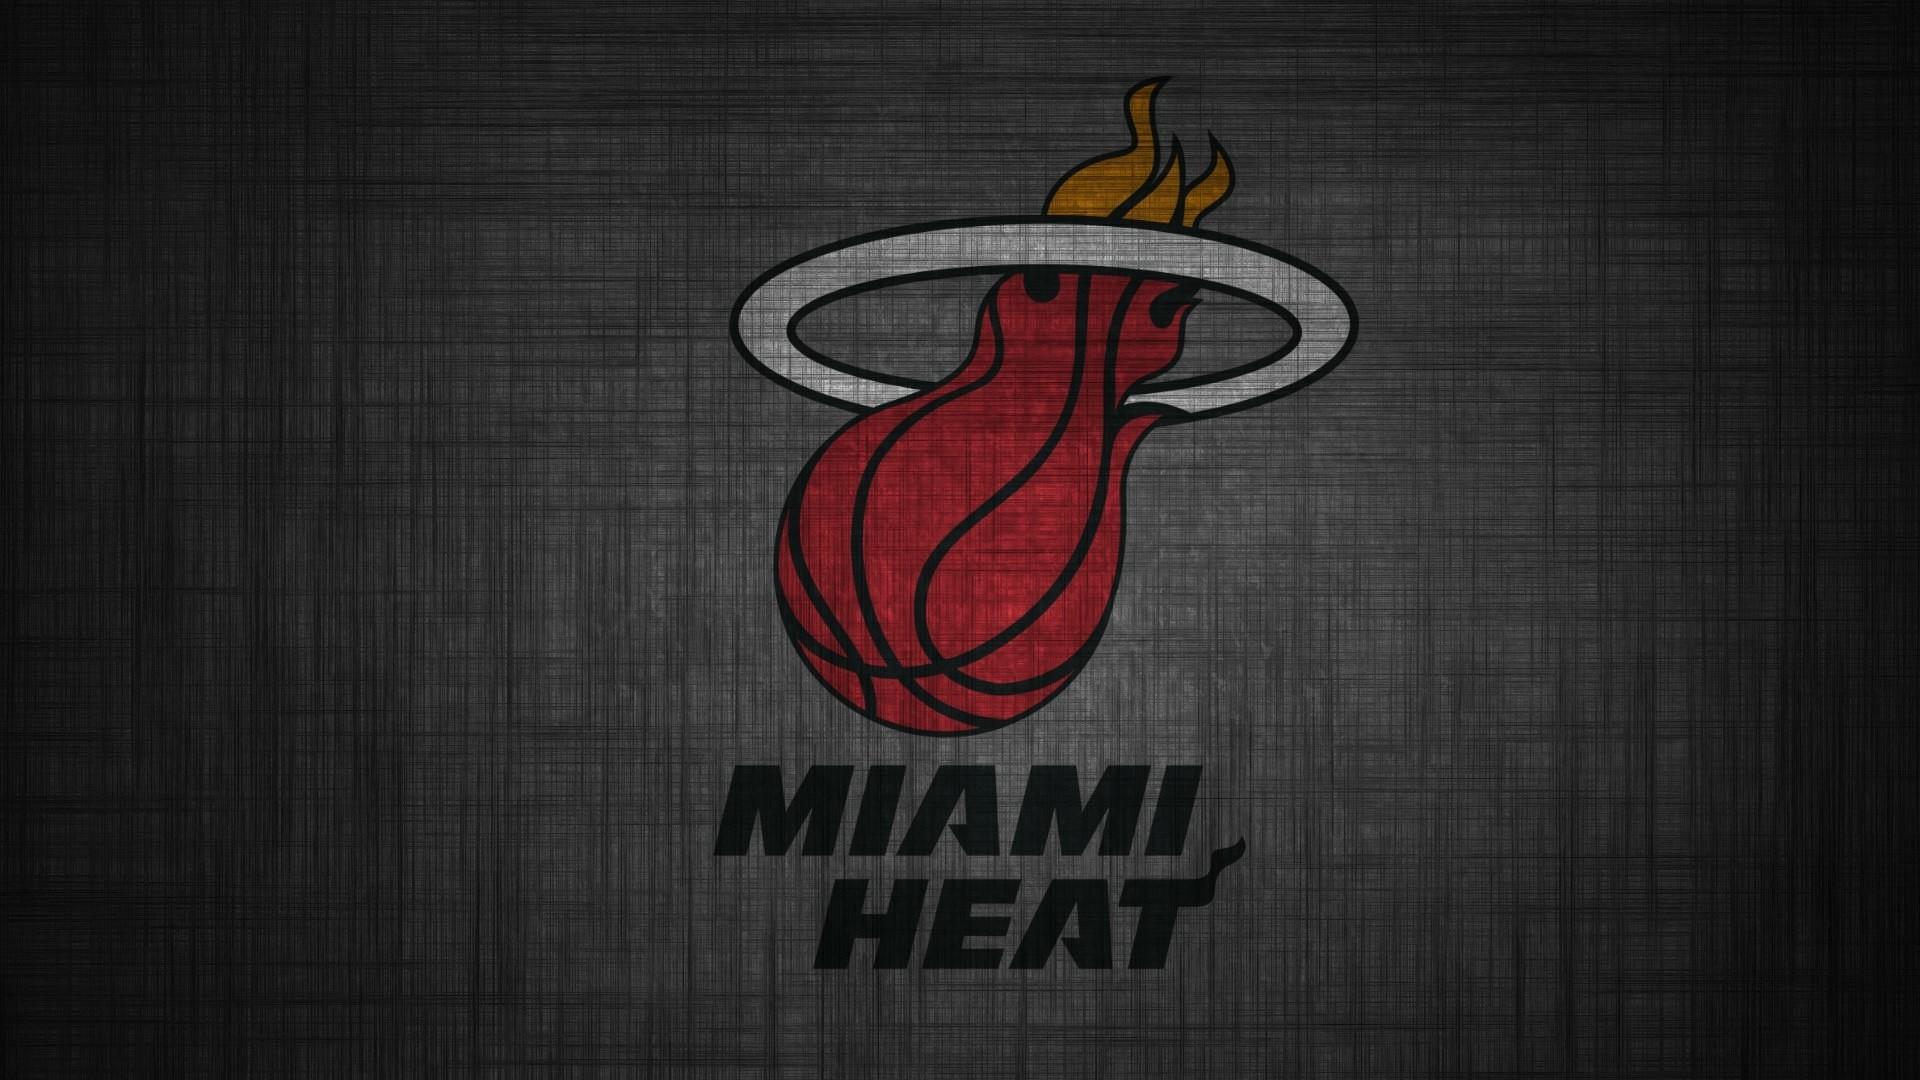 Miami Heat Wallpaper 2018 Hd 67 Pictures